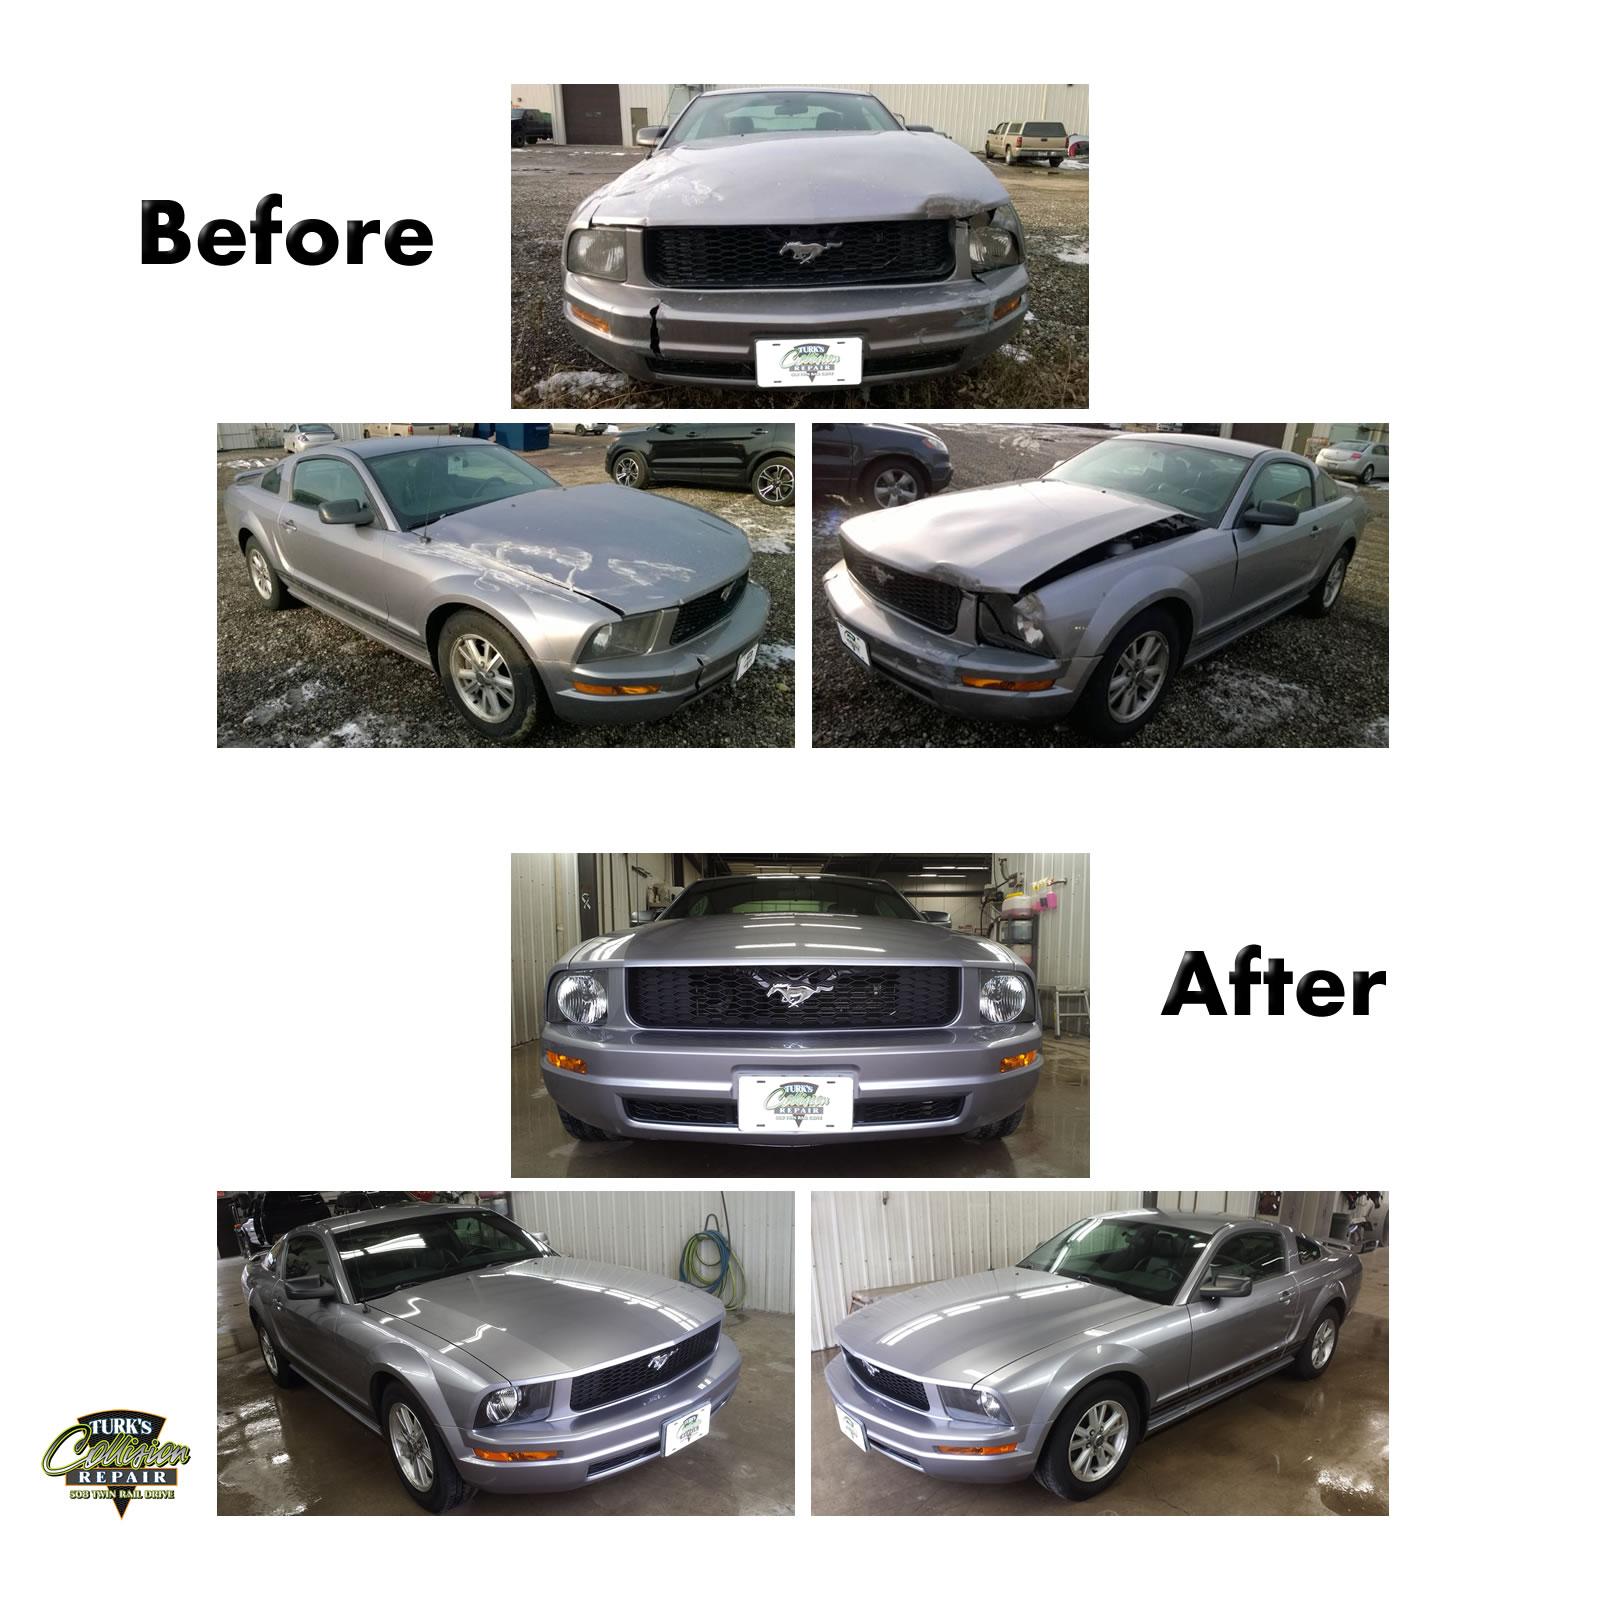 Ford Mustang Collision Repair